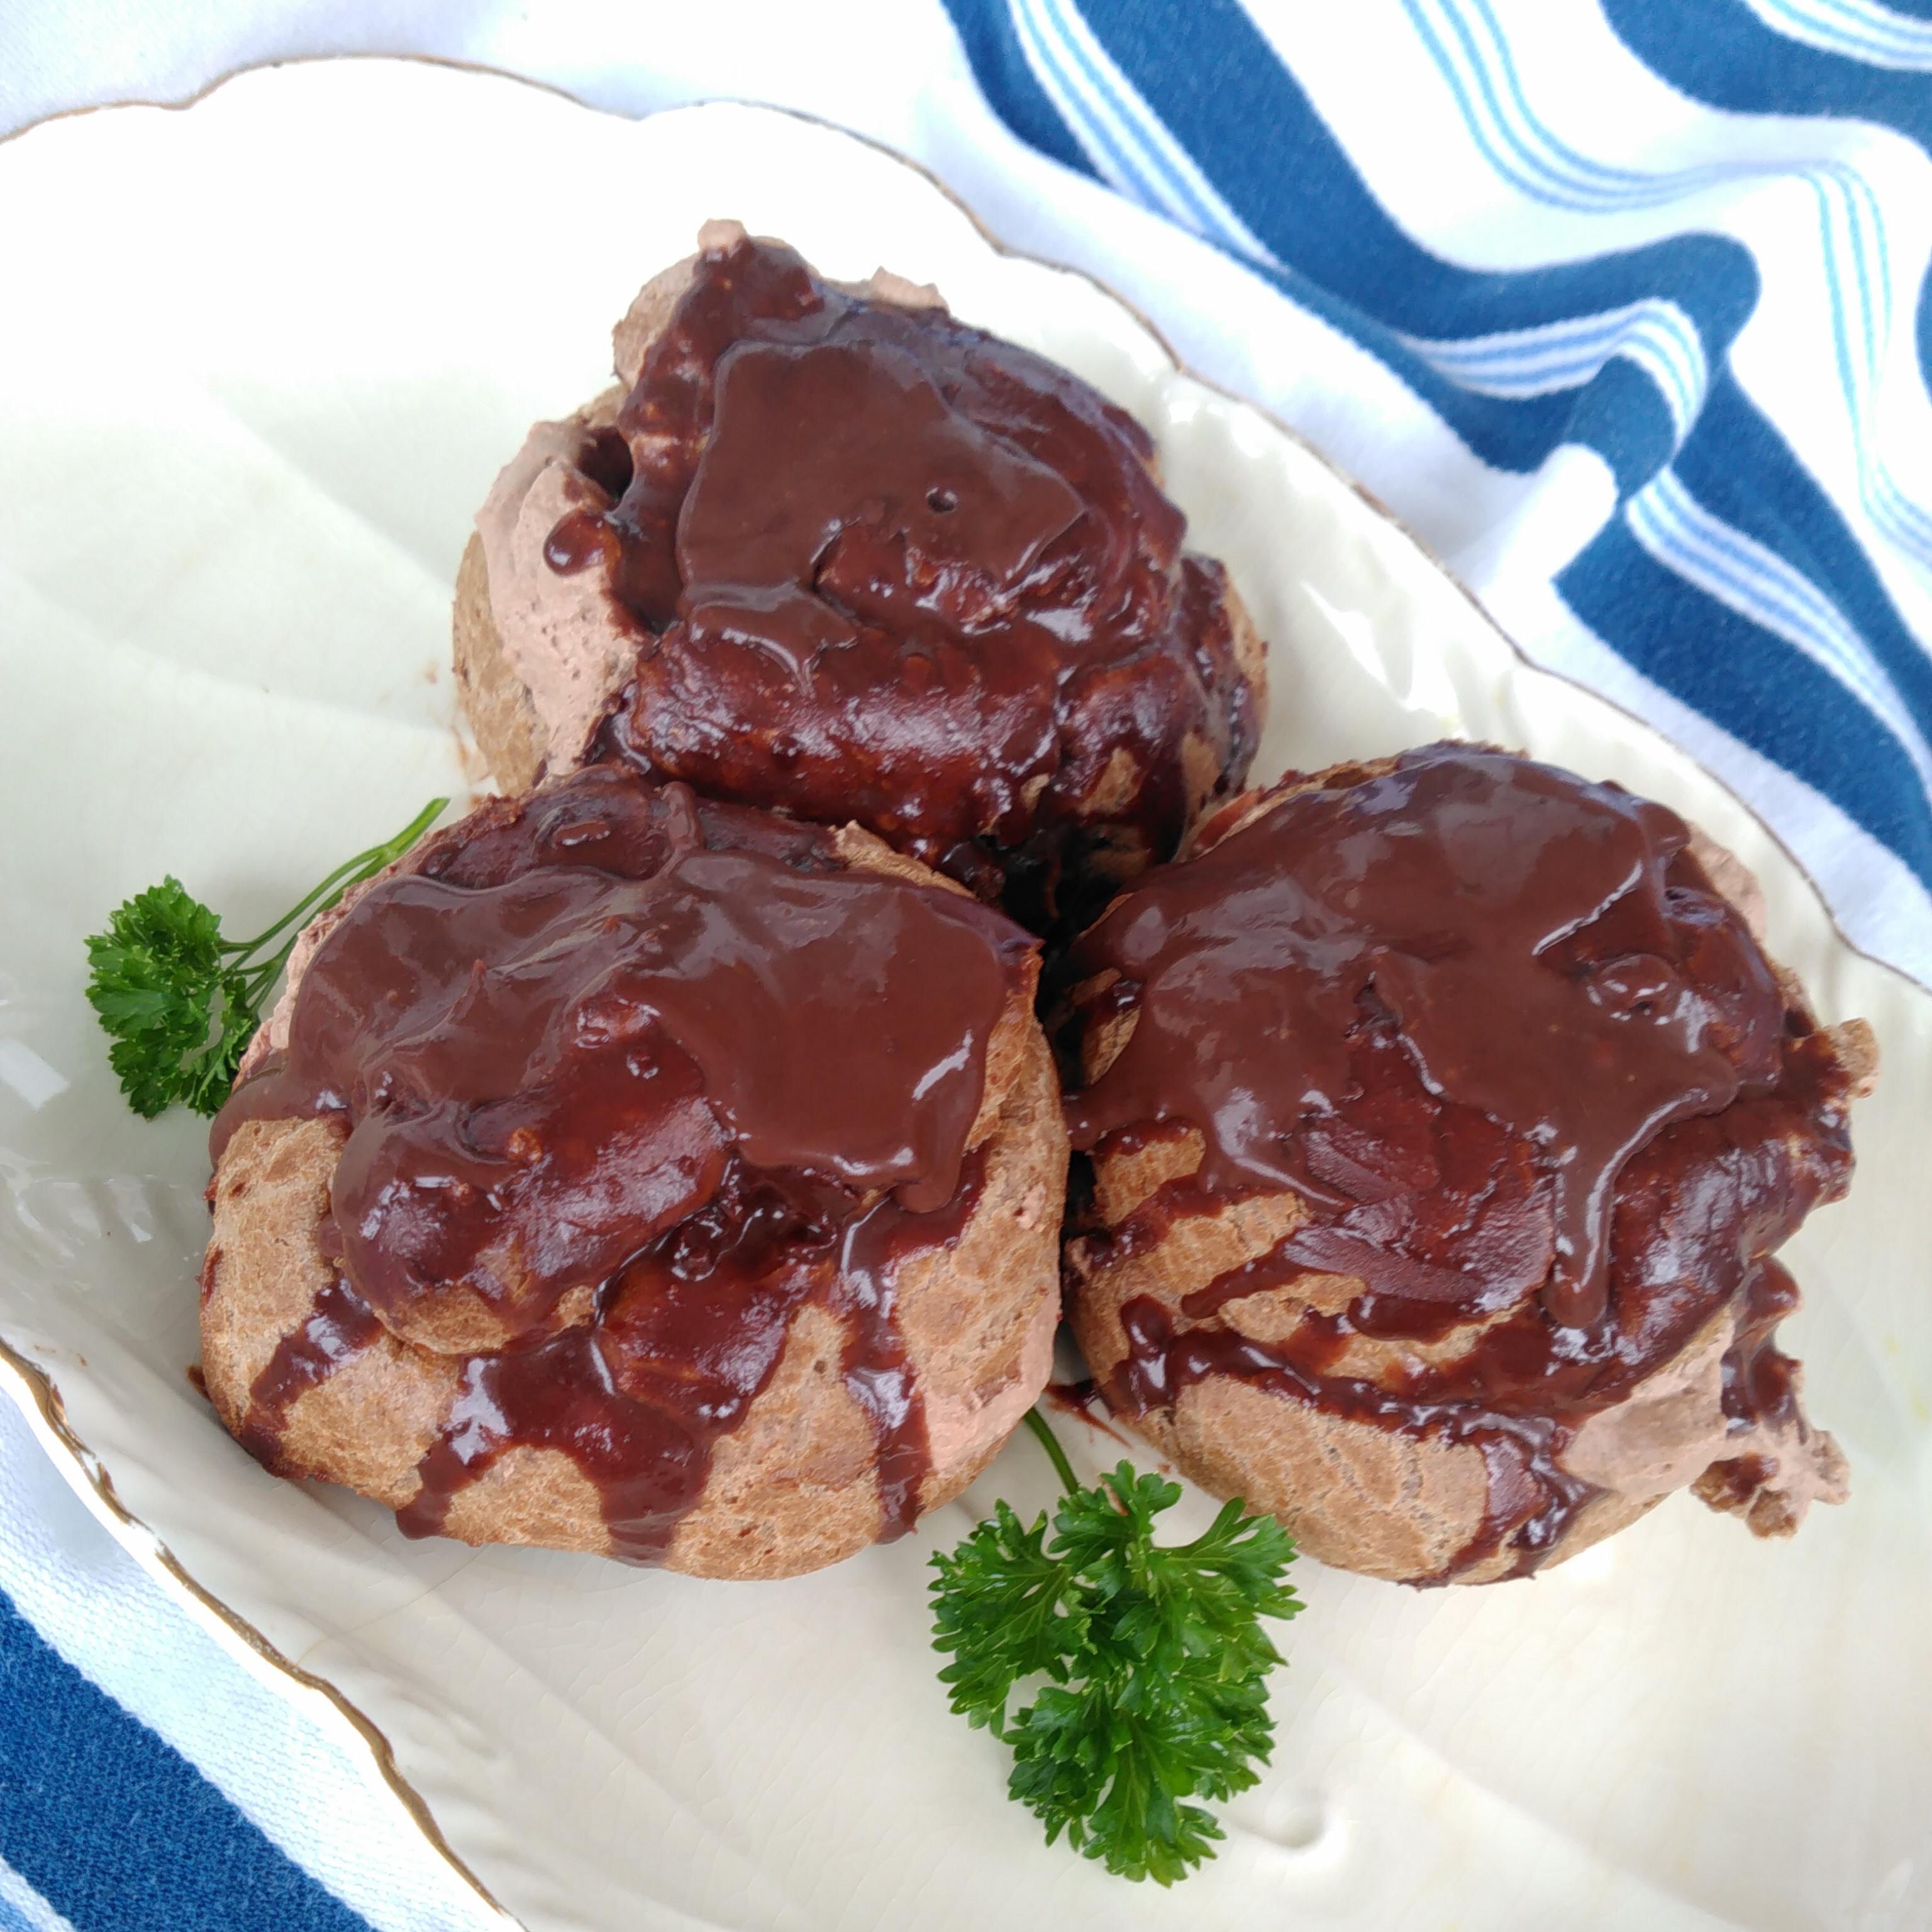 Chocolate Cream Puffs